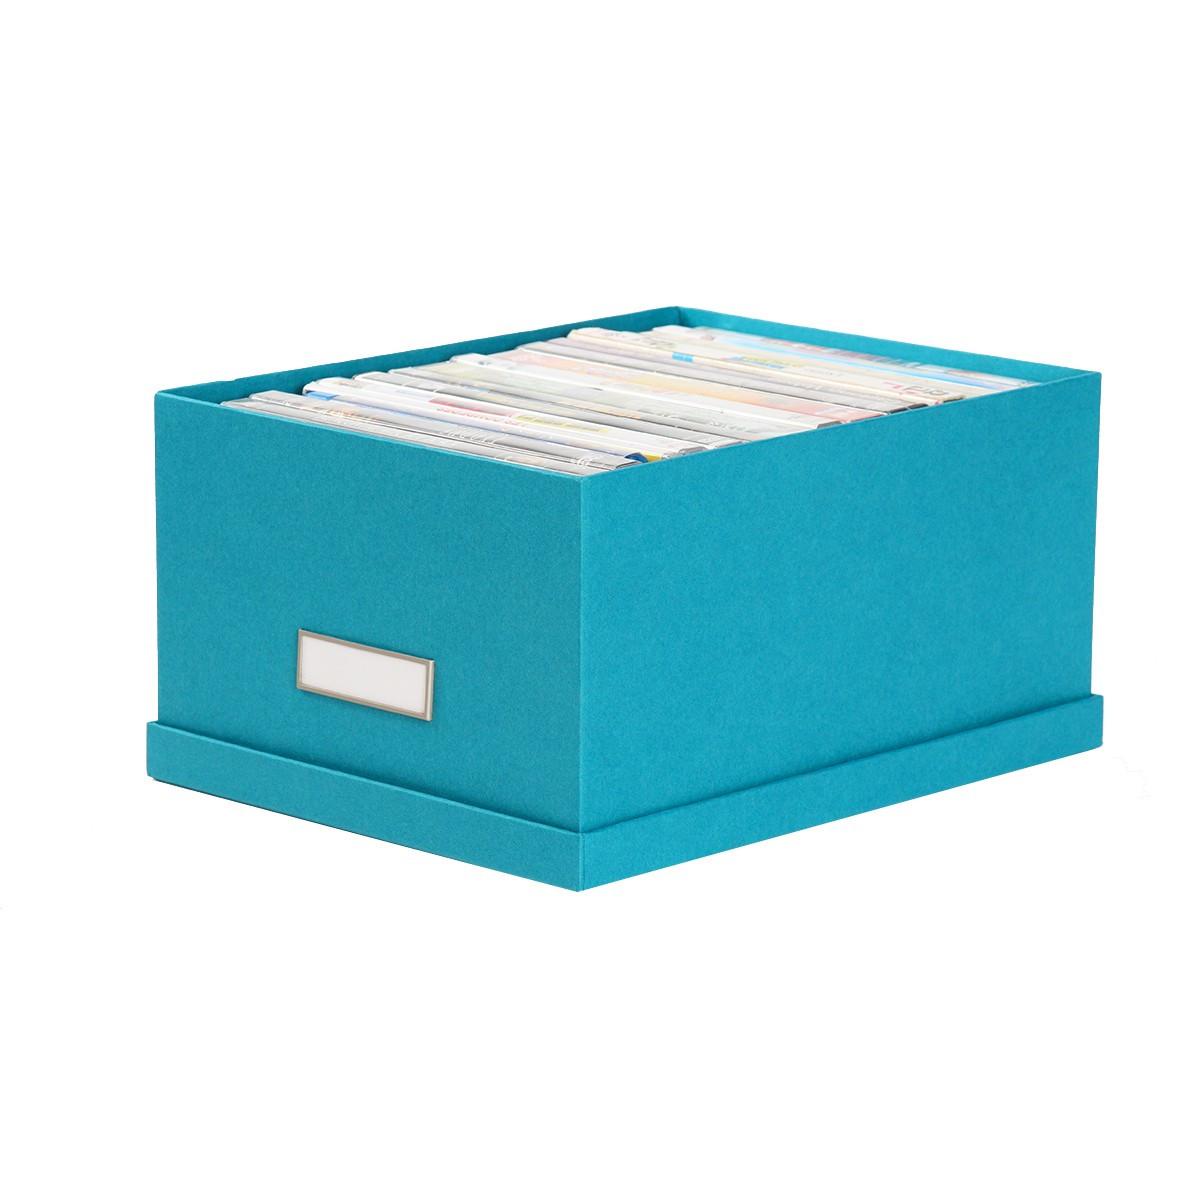 bo te de rangement dvd en carton turquoise. Black Bedroom Furniture Sets. Home Design Ideas